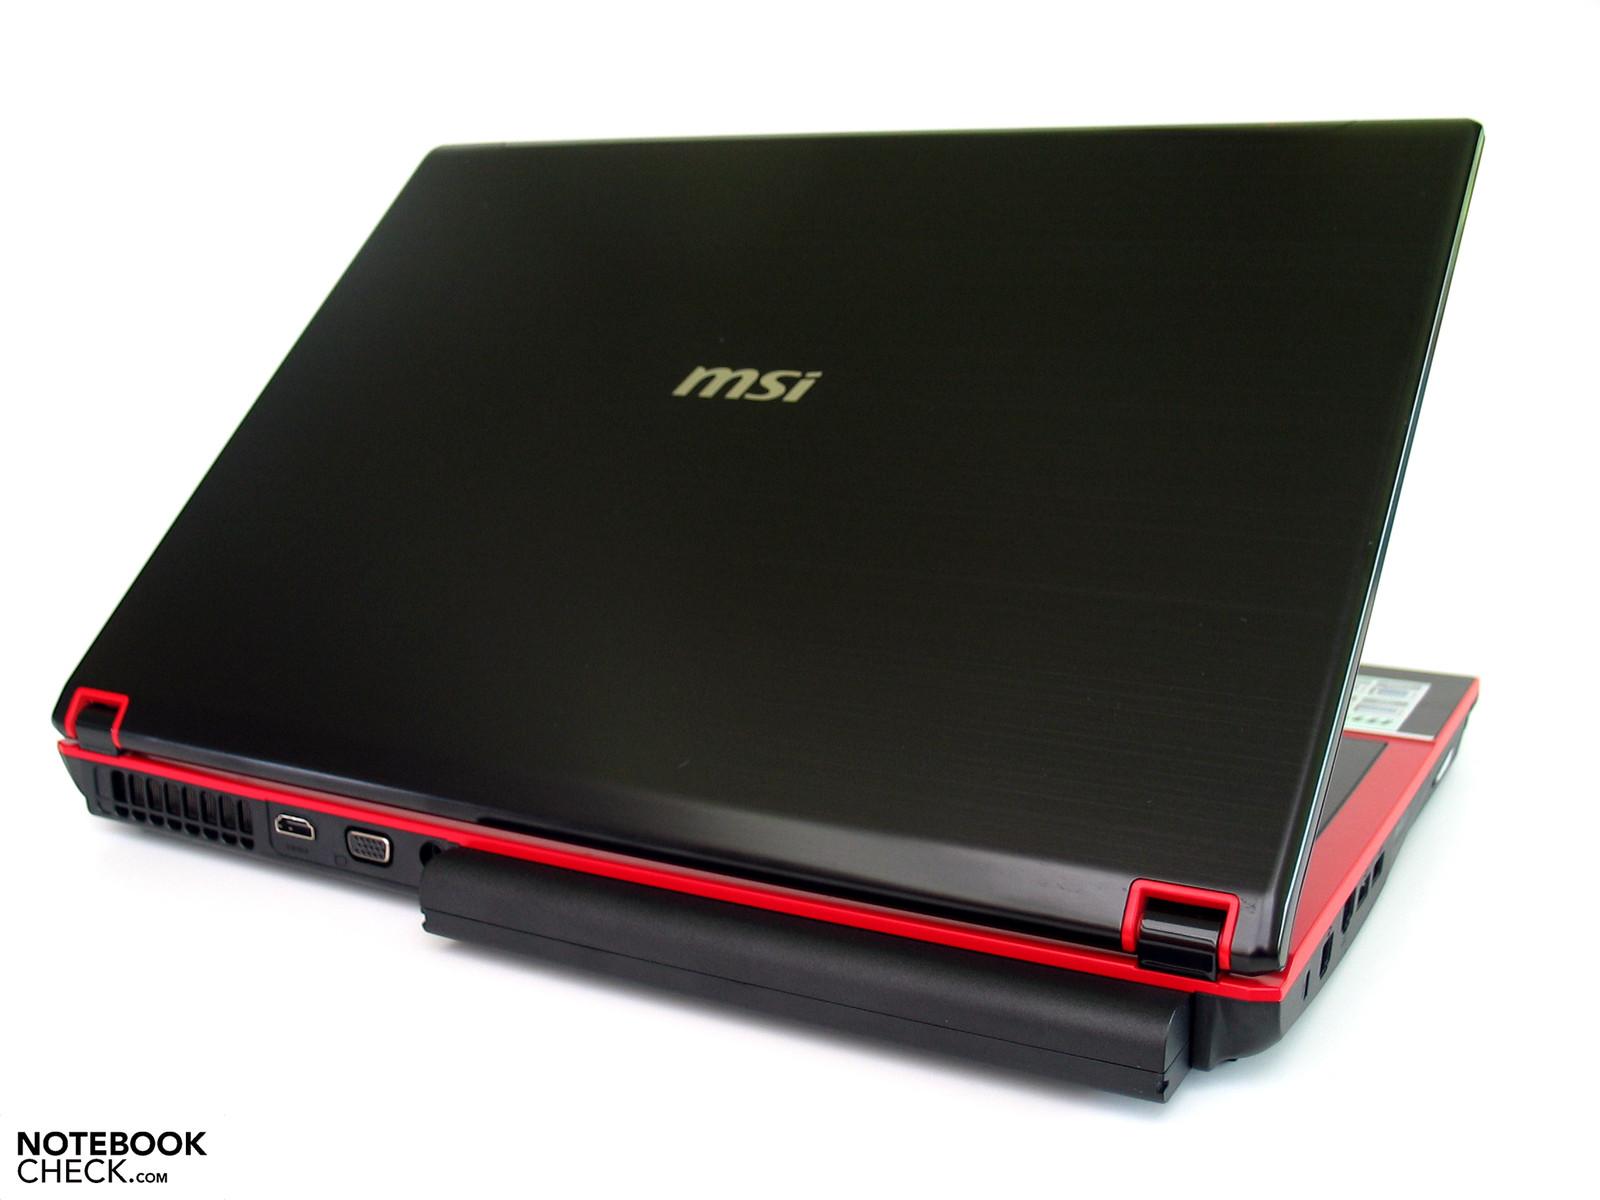 Ноутбук MSI GS72 6QE-437RU 9S7-177514-437 (Intel Core i5-6300HQ 2.3 GHz/16384Mb/1000Gb/No ODD/nVidia GeForce GTX 970M 3072Mb/Wi-Fi/Bluetooth/Cam/17.3/1920x1080/Windows 10 64-bit)